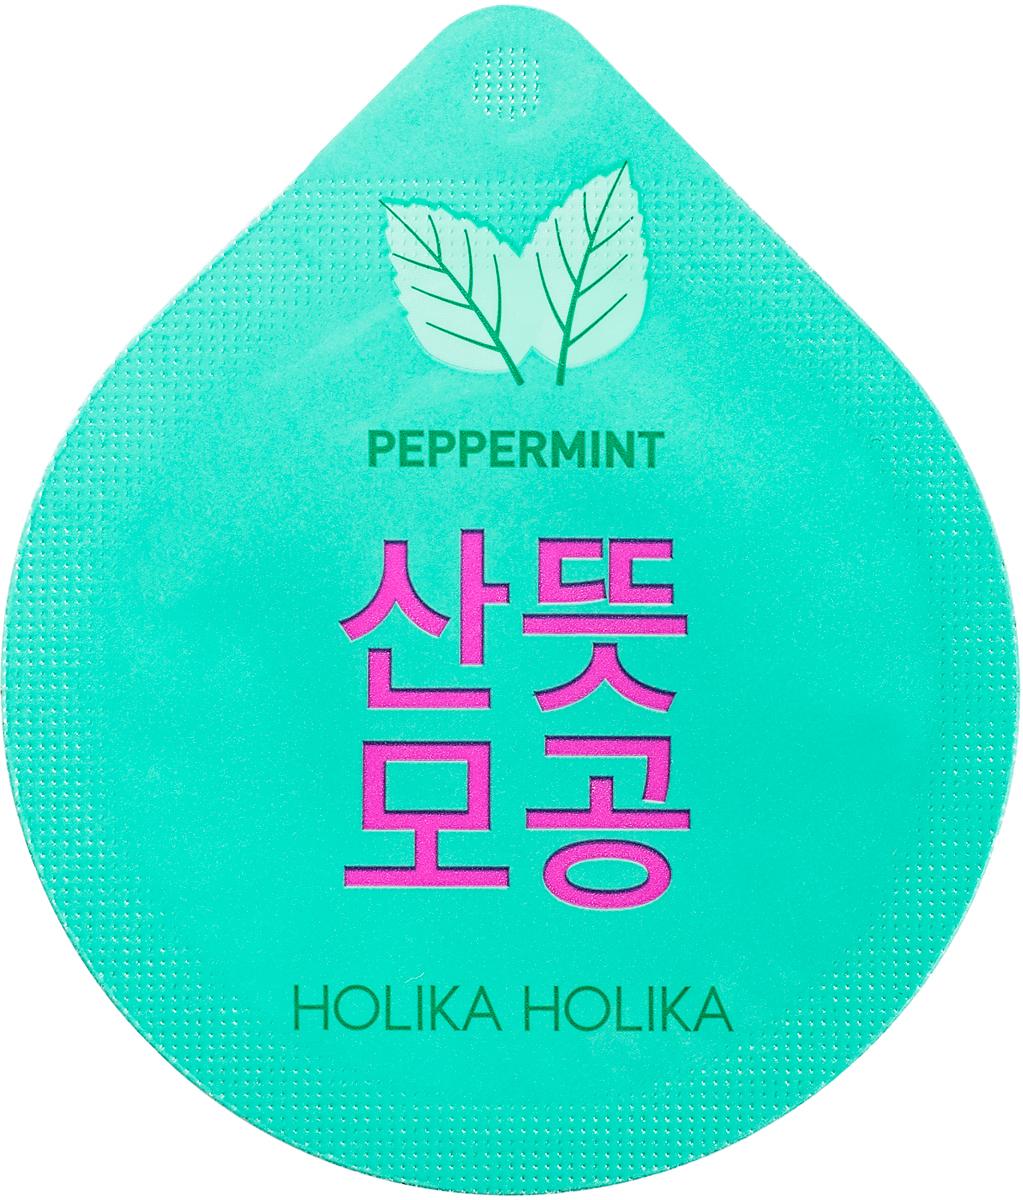 Holika Holika КапсульнаясмываемаямаскаSuperfood,очищающаяпоры,10г skinfood freshmade маска смываемая клюквенная freshmade маска смываемая клюквенная